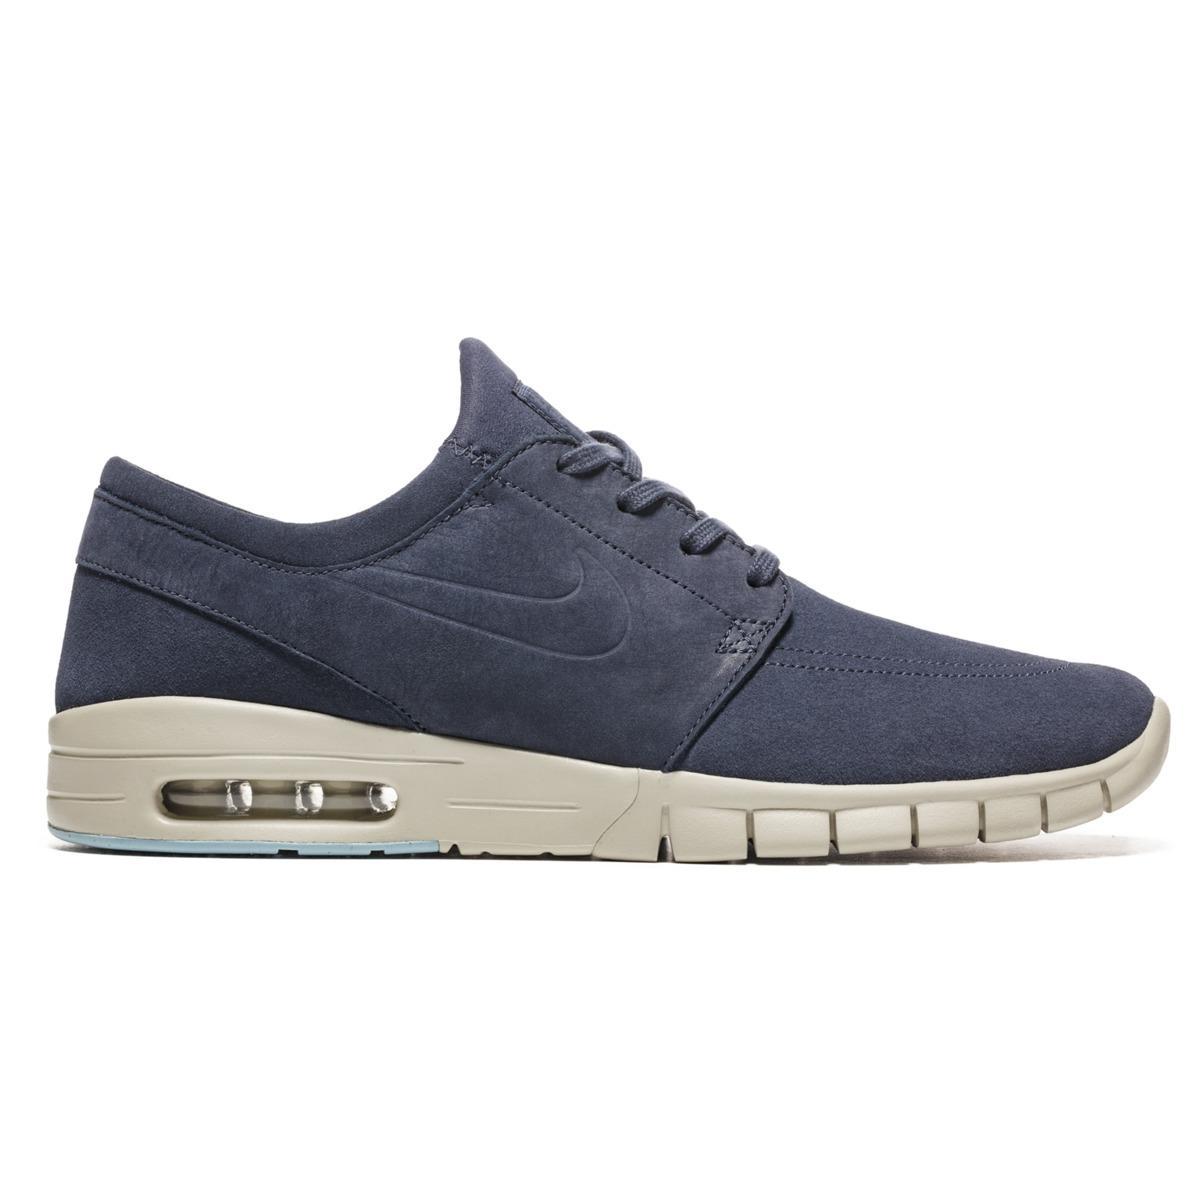 30ec8c51ca9 Nike Sb Stefan Janoski Max Leather Skater Trainers in Blue for Men ...